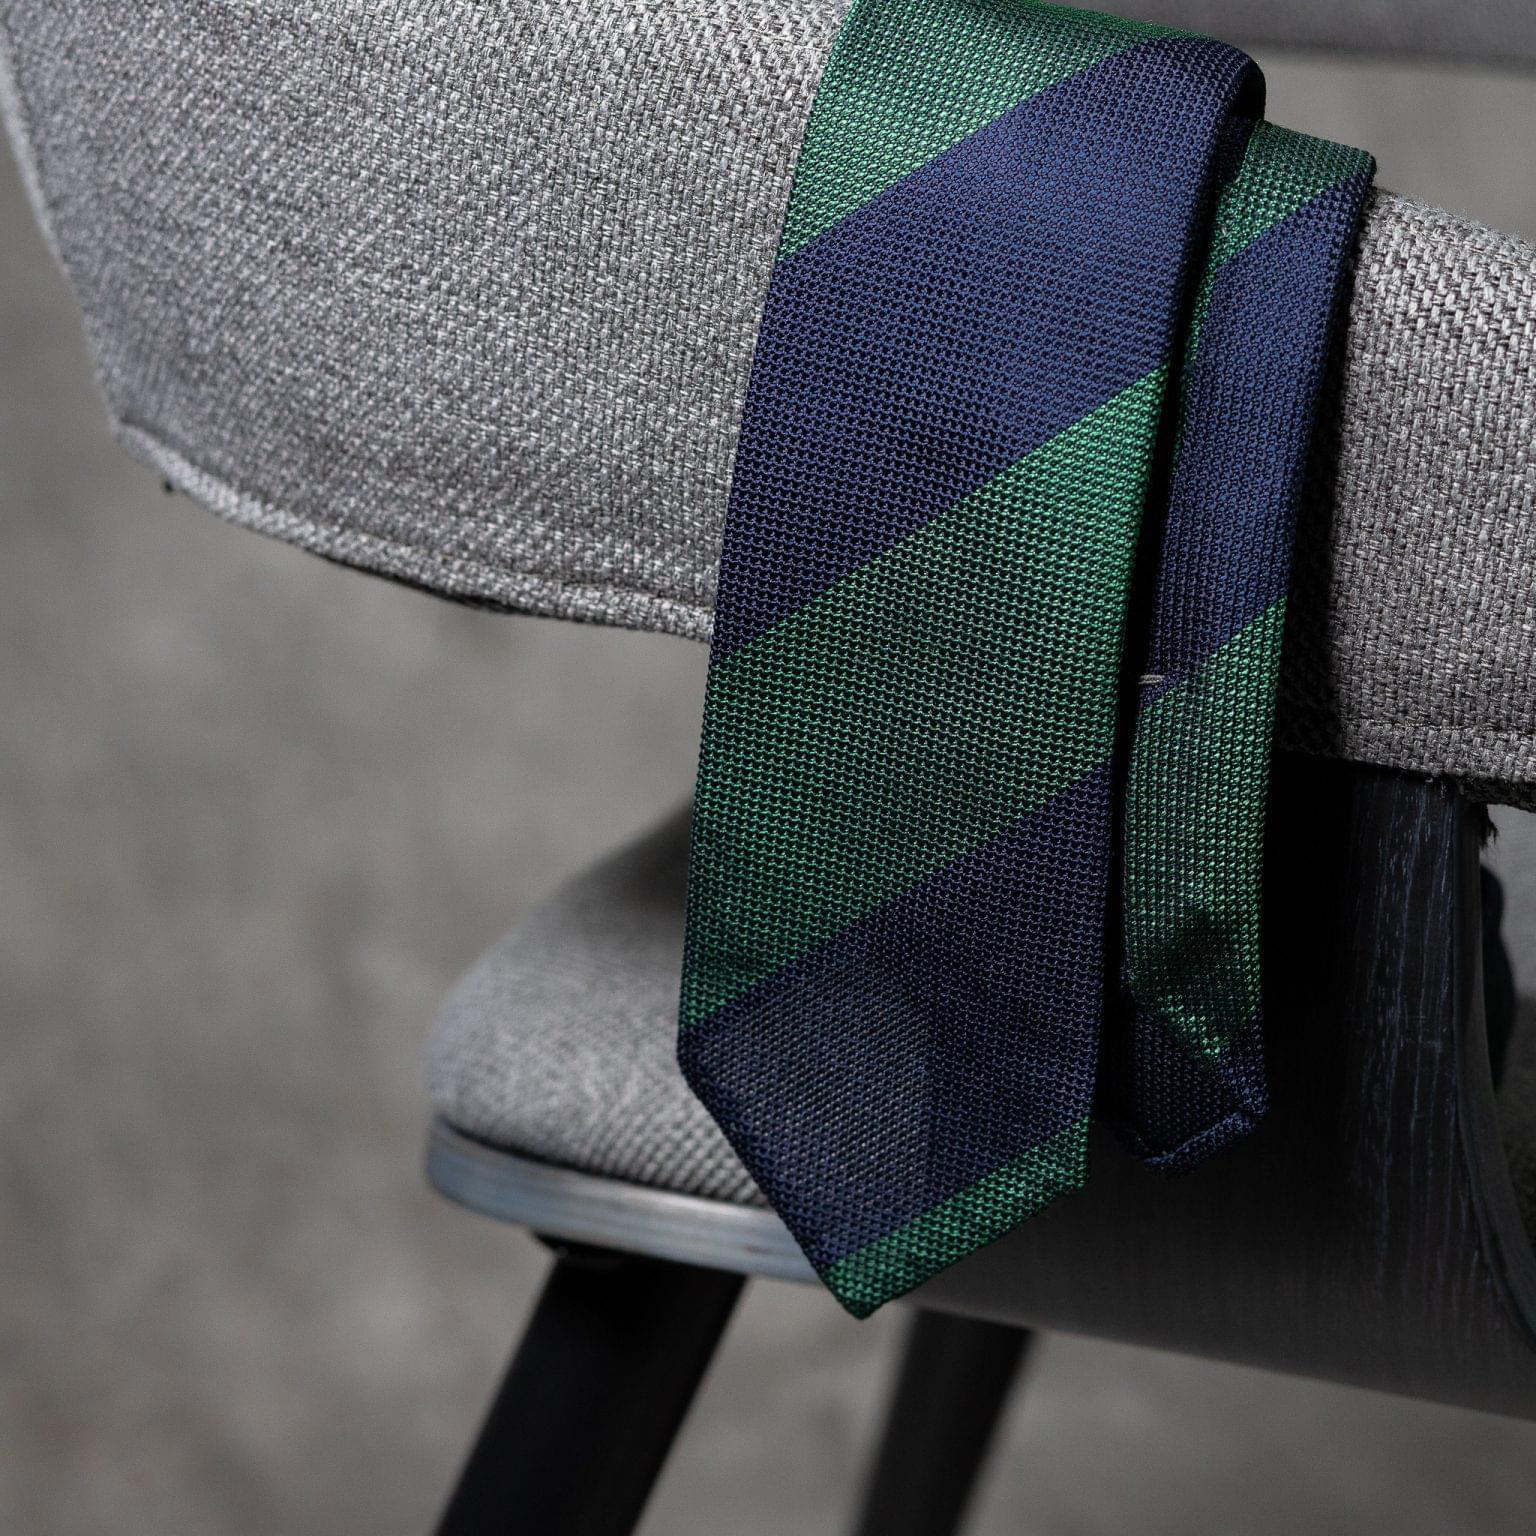 GRENADINE-0523-Tie-Initials-Corbata-Iniciales-The-Seelk-2